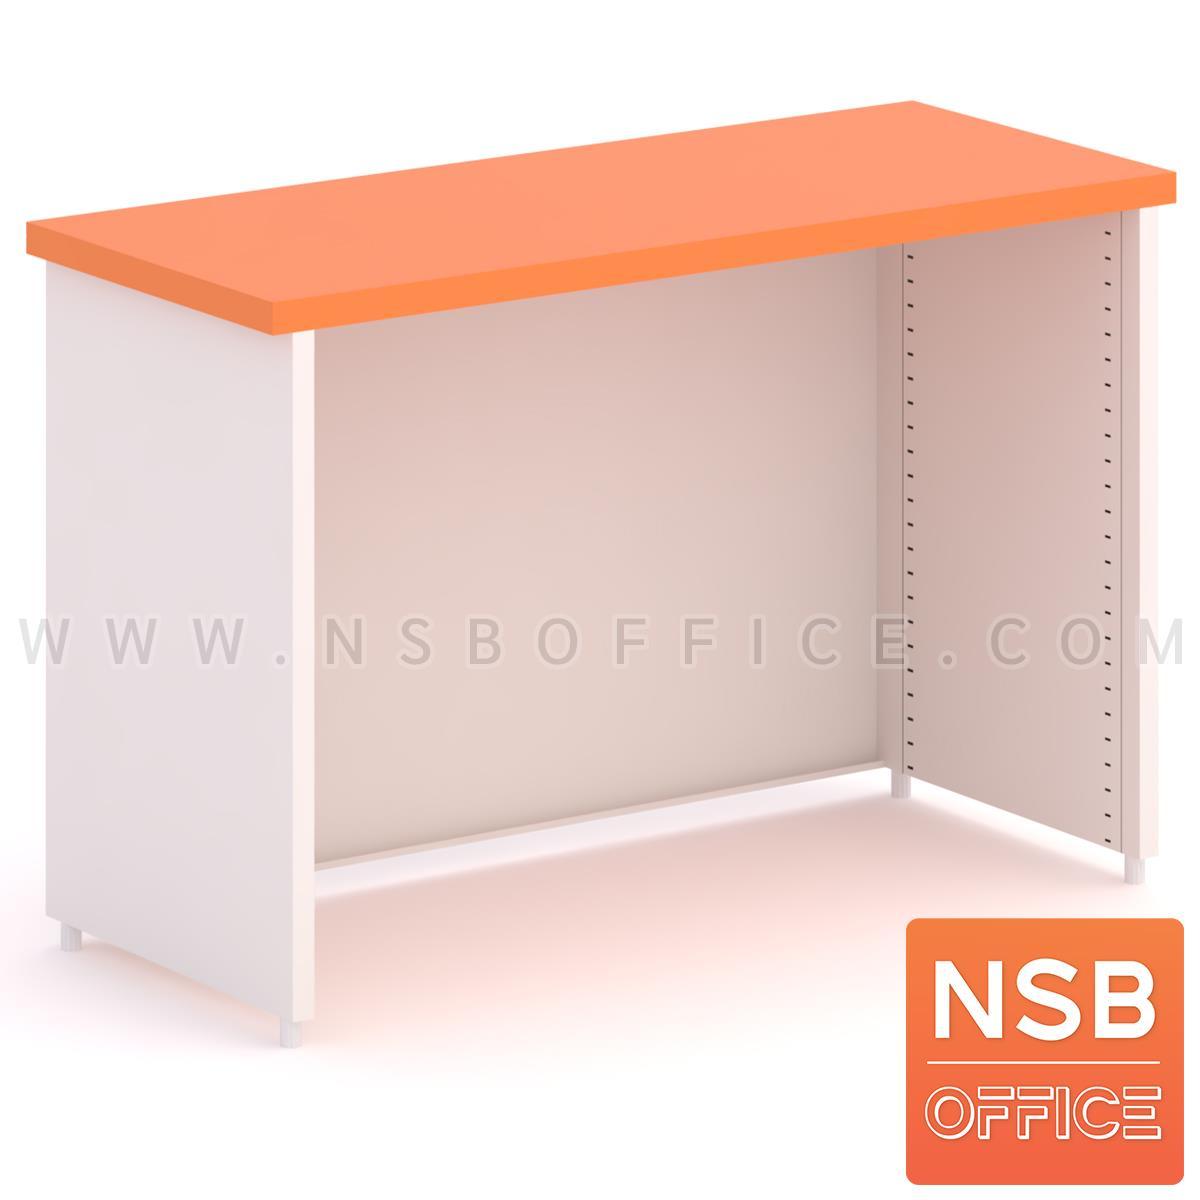 E02A058:โต๊ะทำงานเหล็กล้วน รุ่น Felix (เฟลิกซ์)  พ่นสีอีพ๊อกซี่ (EPOXY)